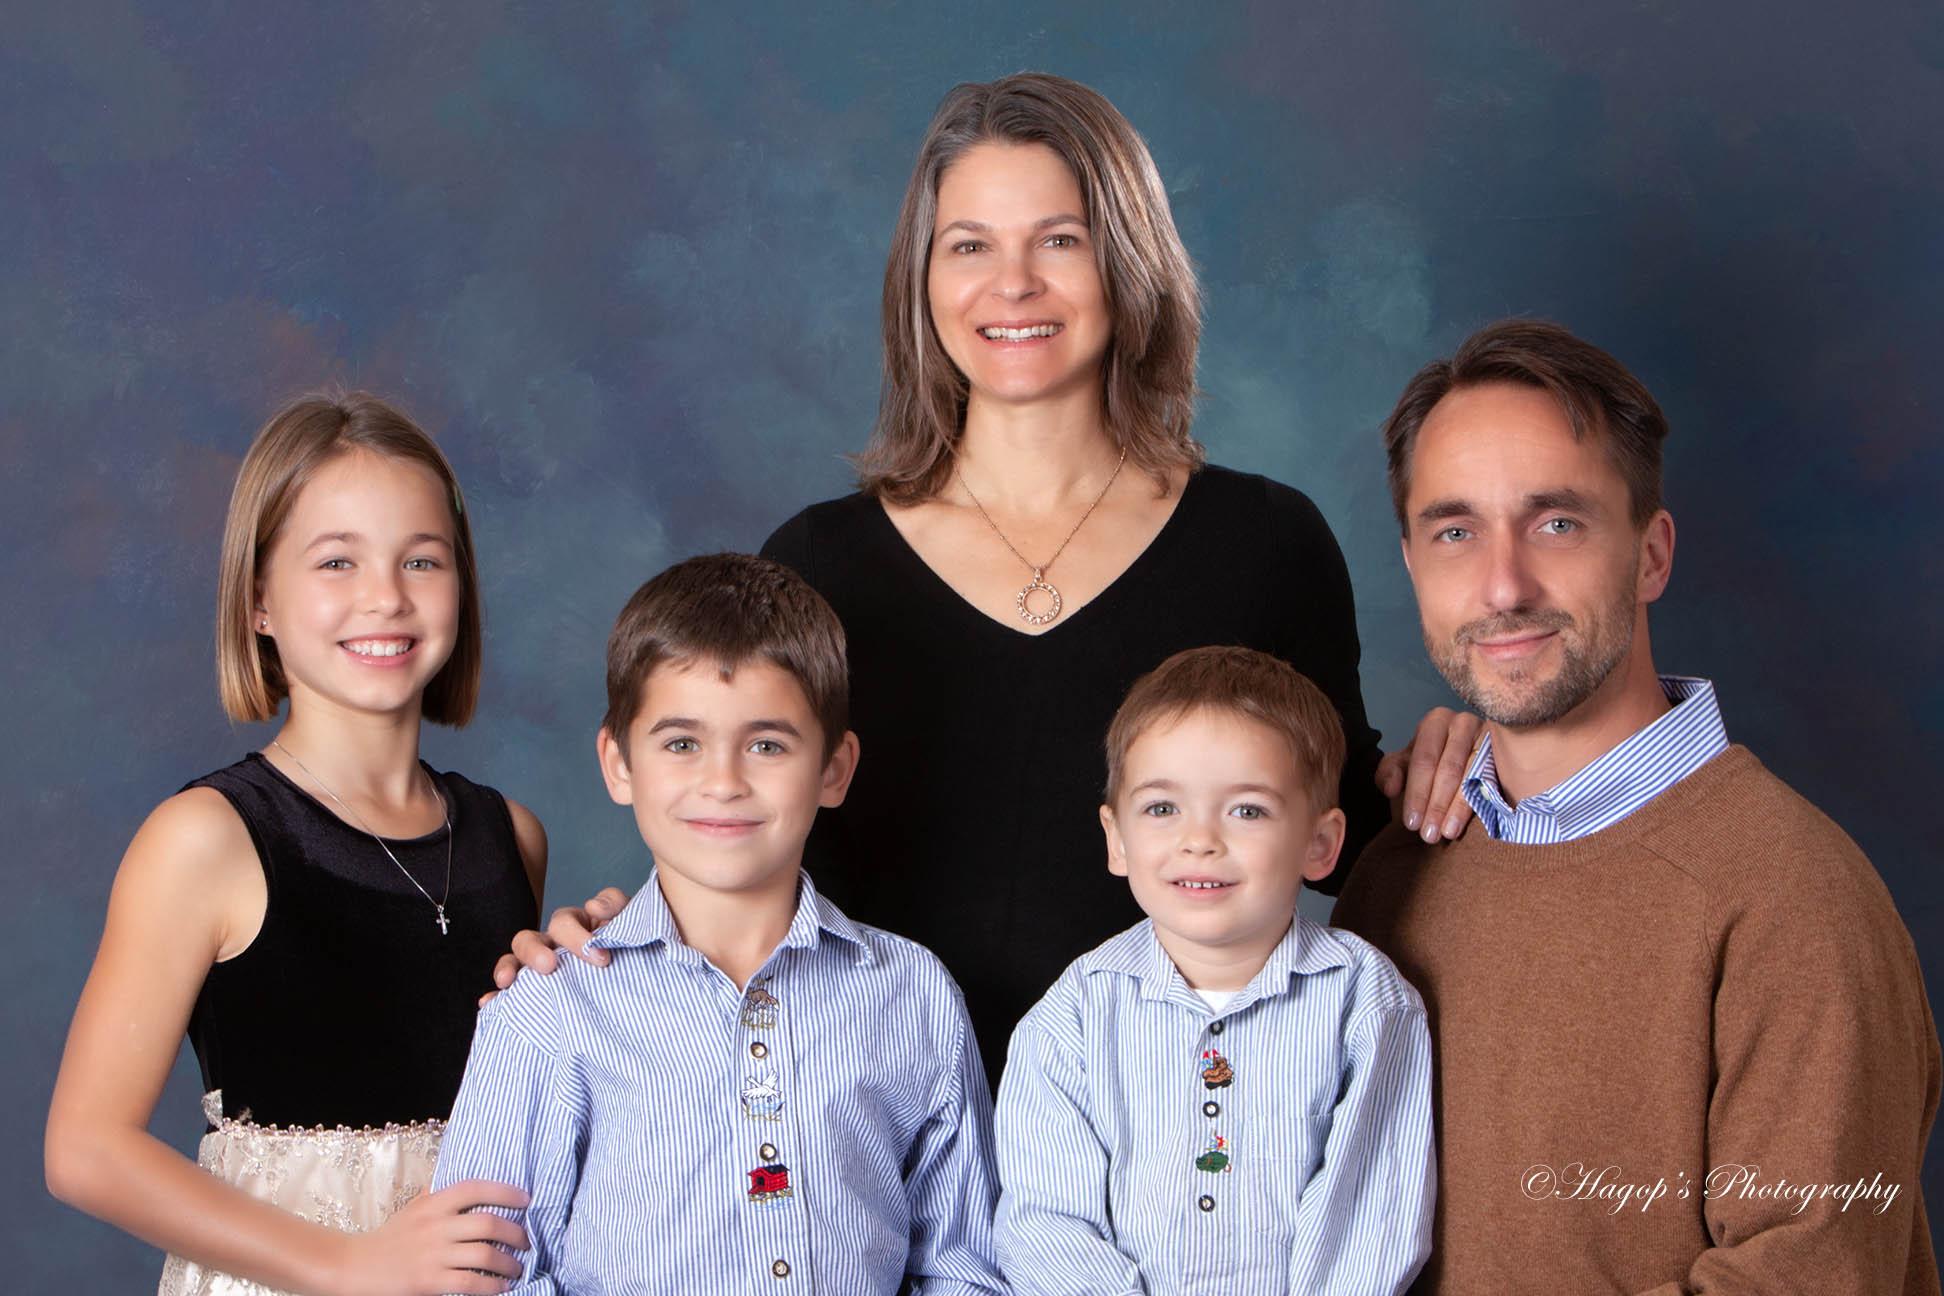 studio portrait of the parents with 3 children